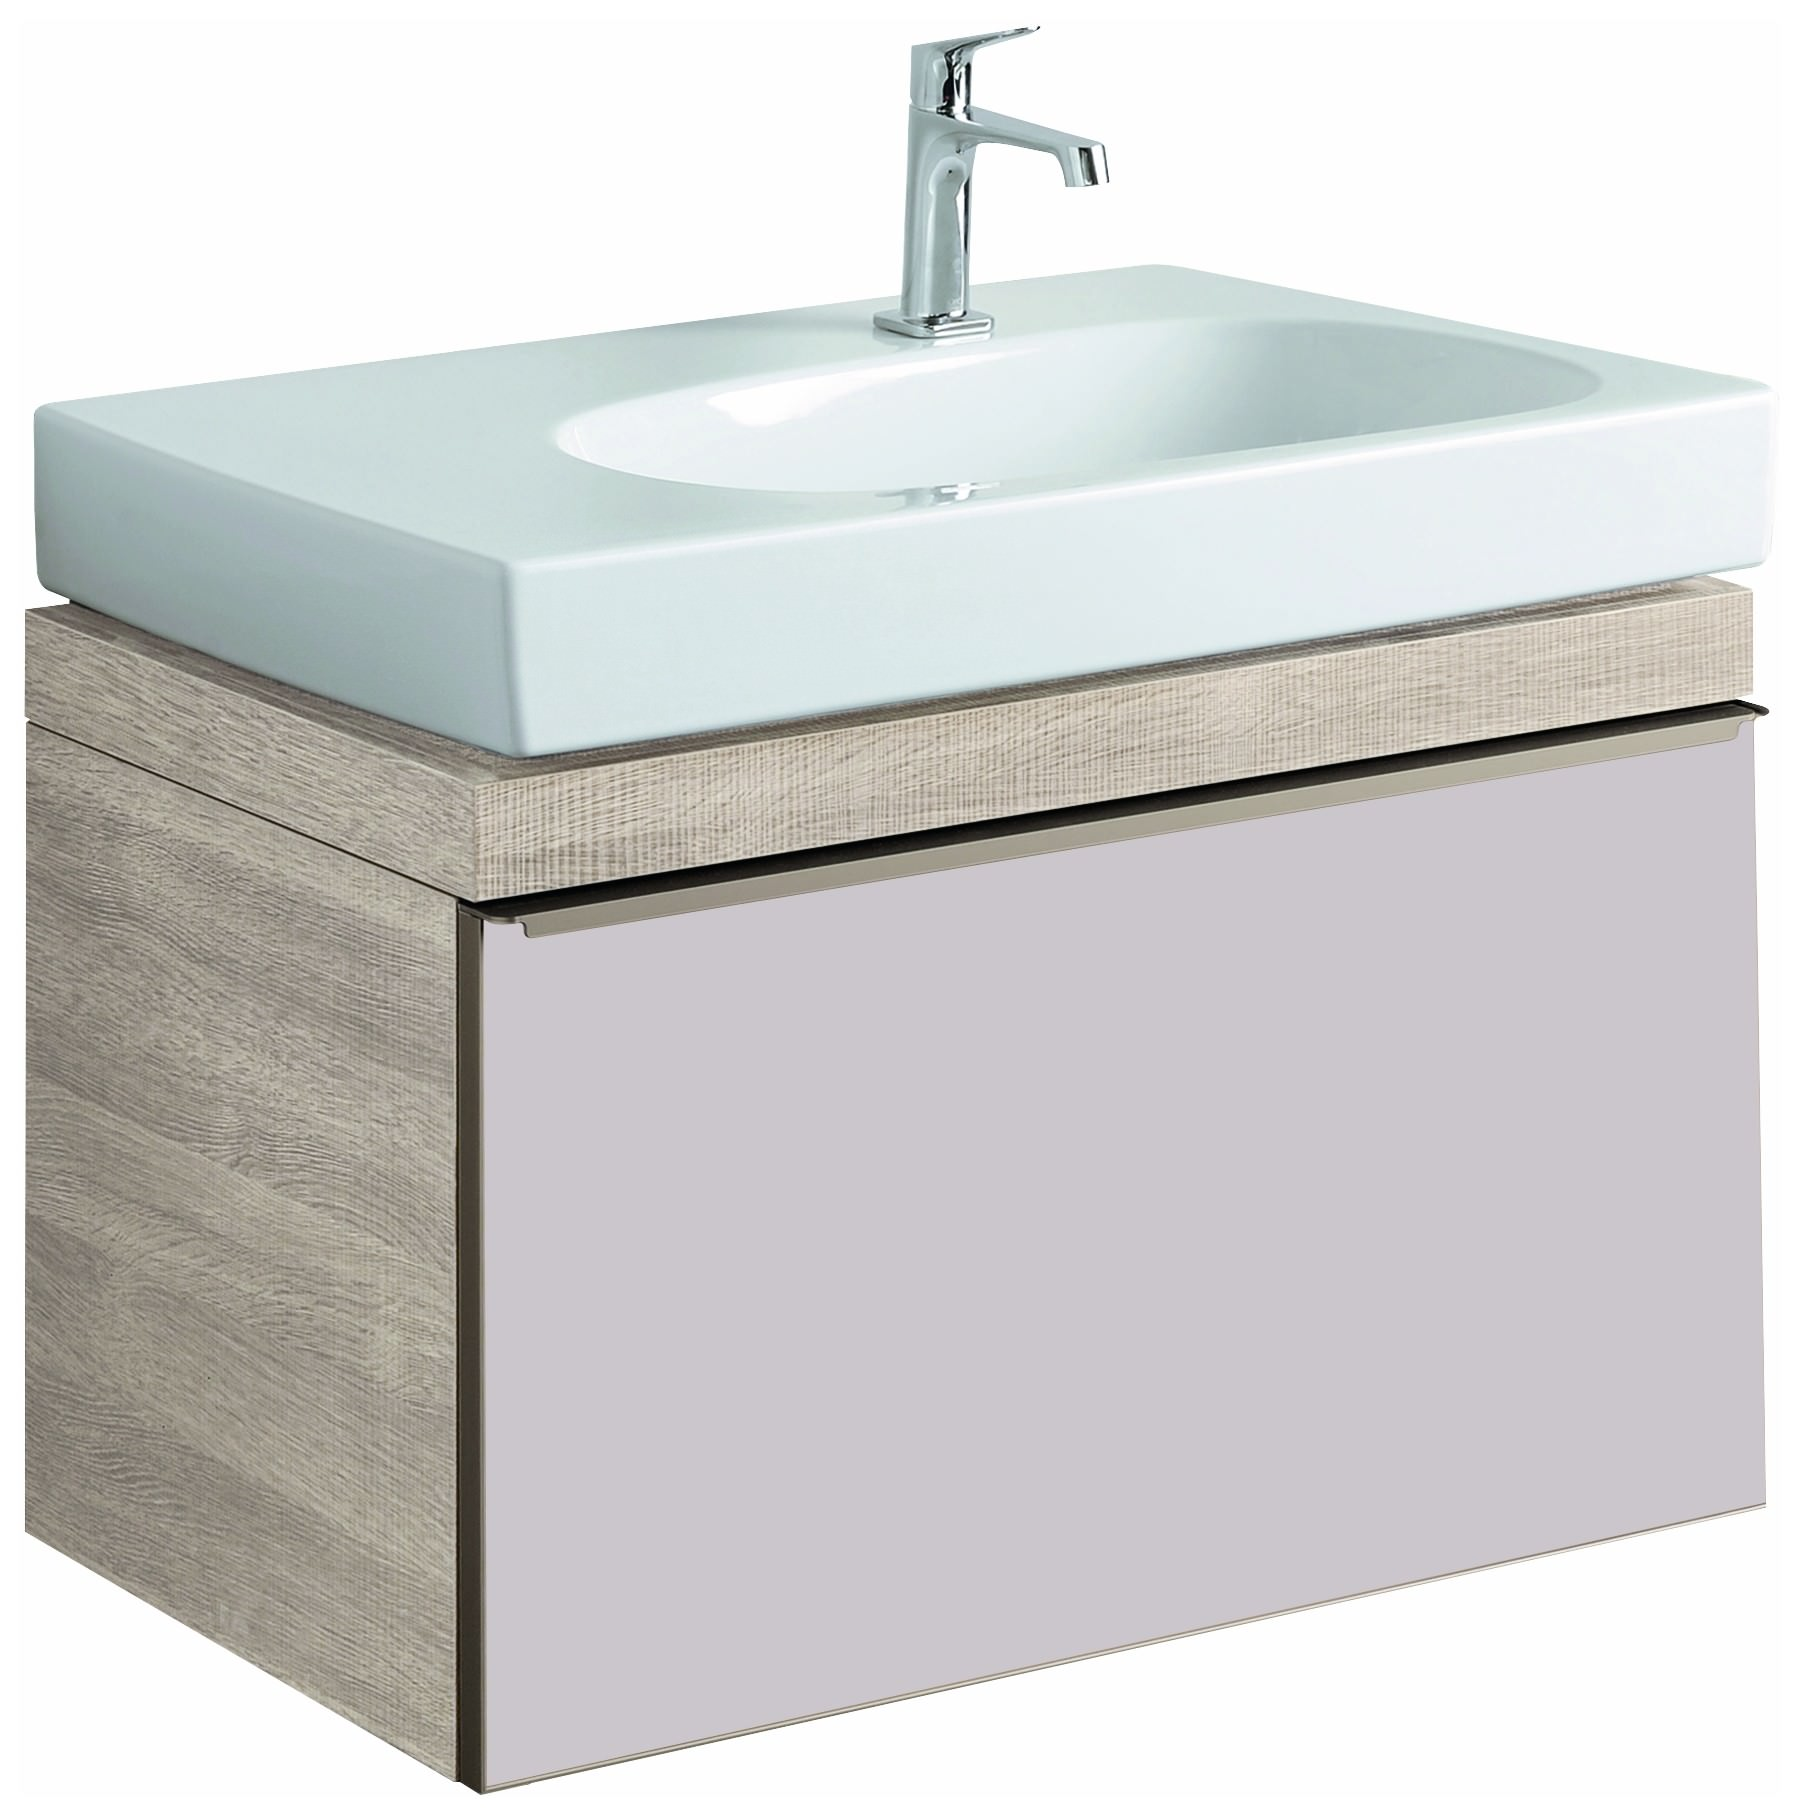 keramag citterio waschtischunterschrank 734x554x504mm. Black Bedroom Furniture Sets. Home Design Ideas